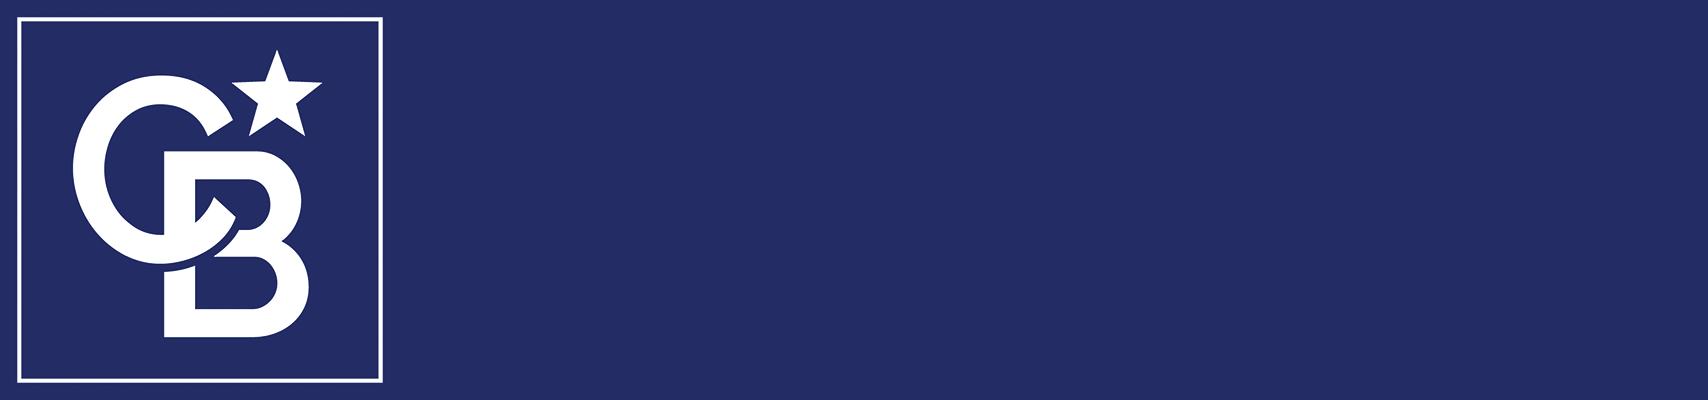 Coldwell Banker Sky Ridge - Kim Sellers Logo